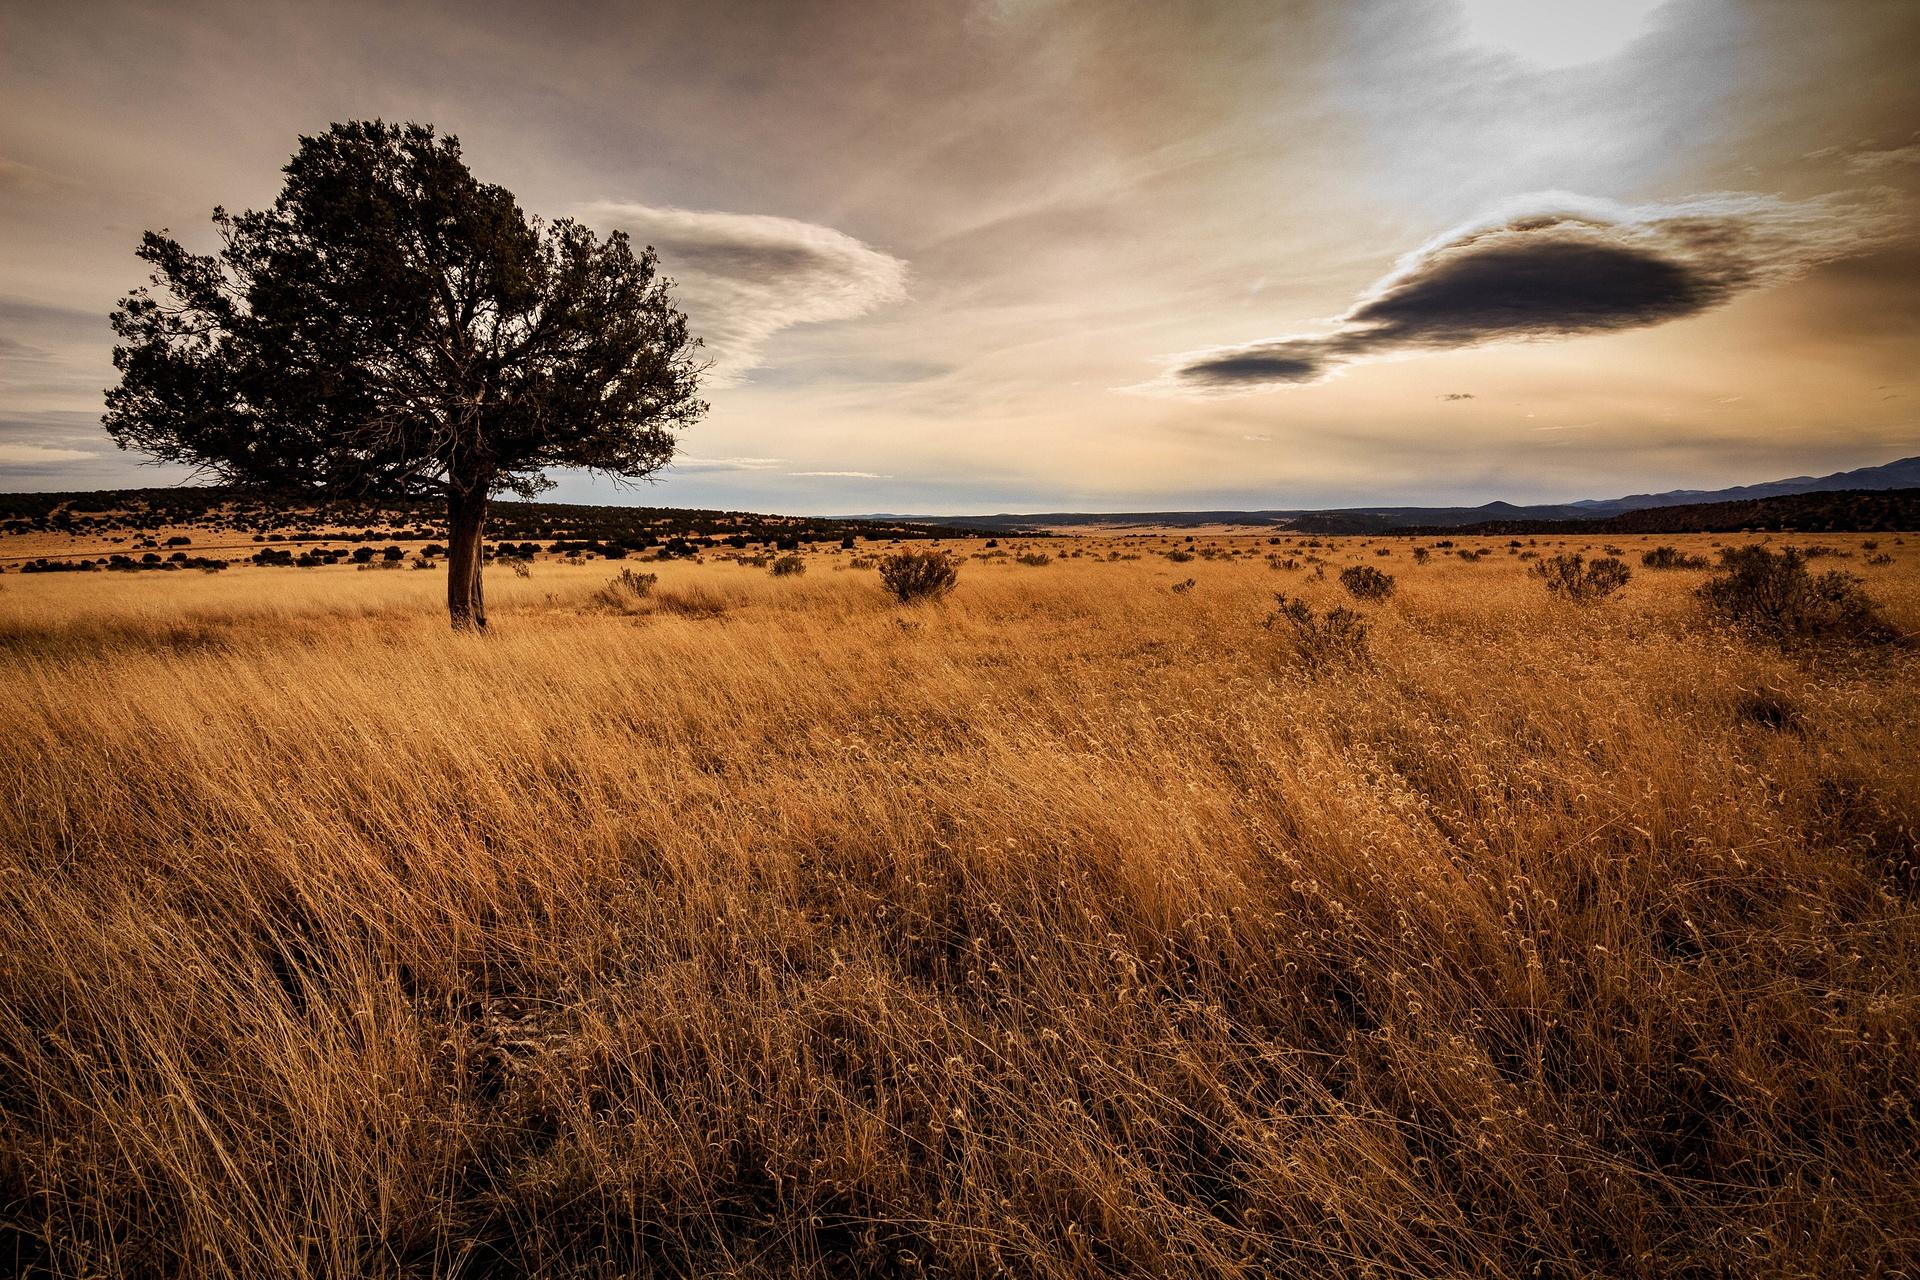 SaddleRockPhotography's Gallery